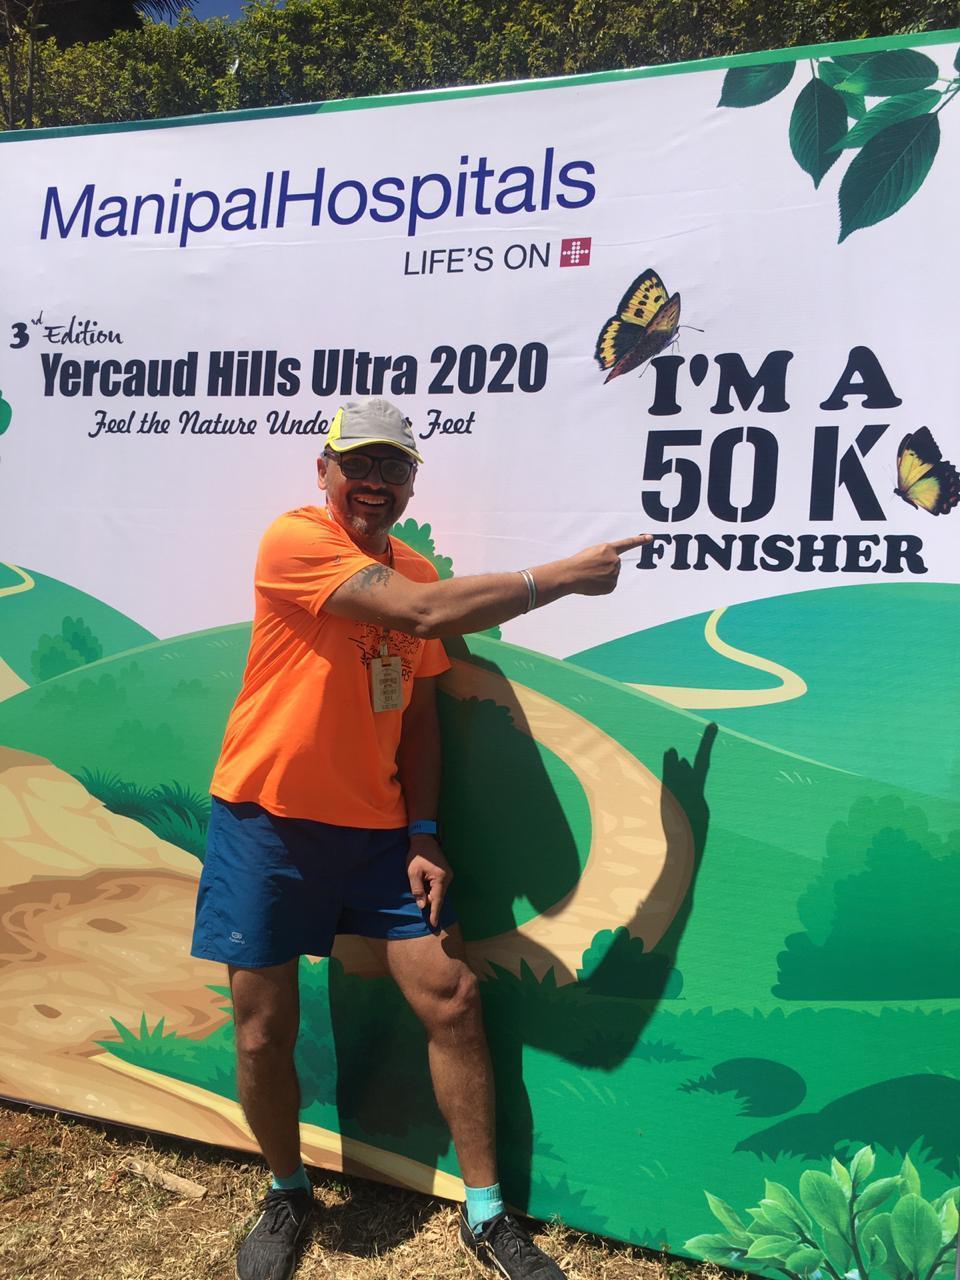 Yercaud Hills Ultra 2020